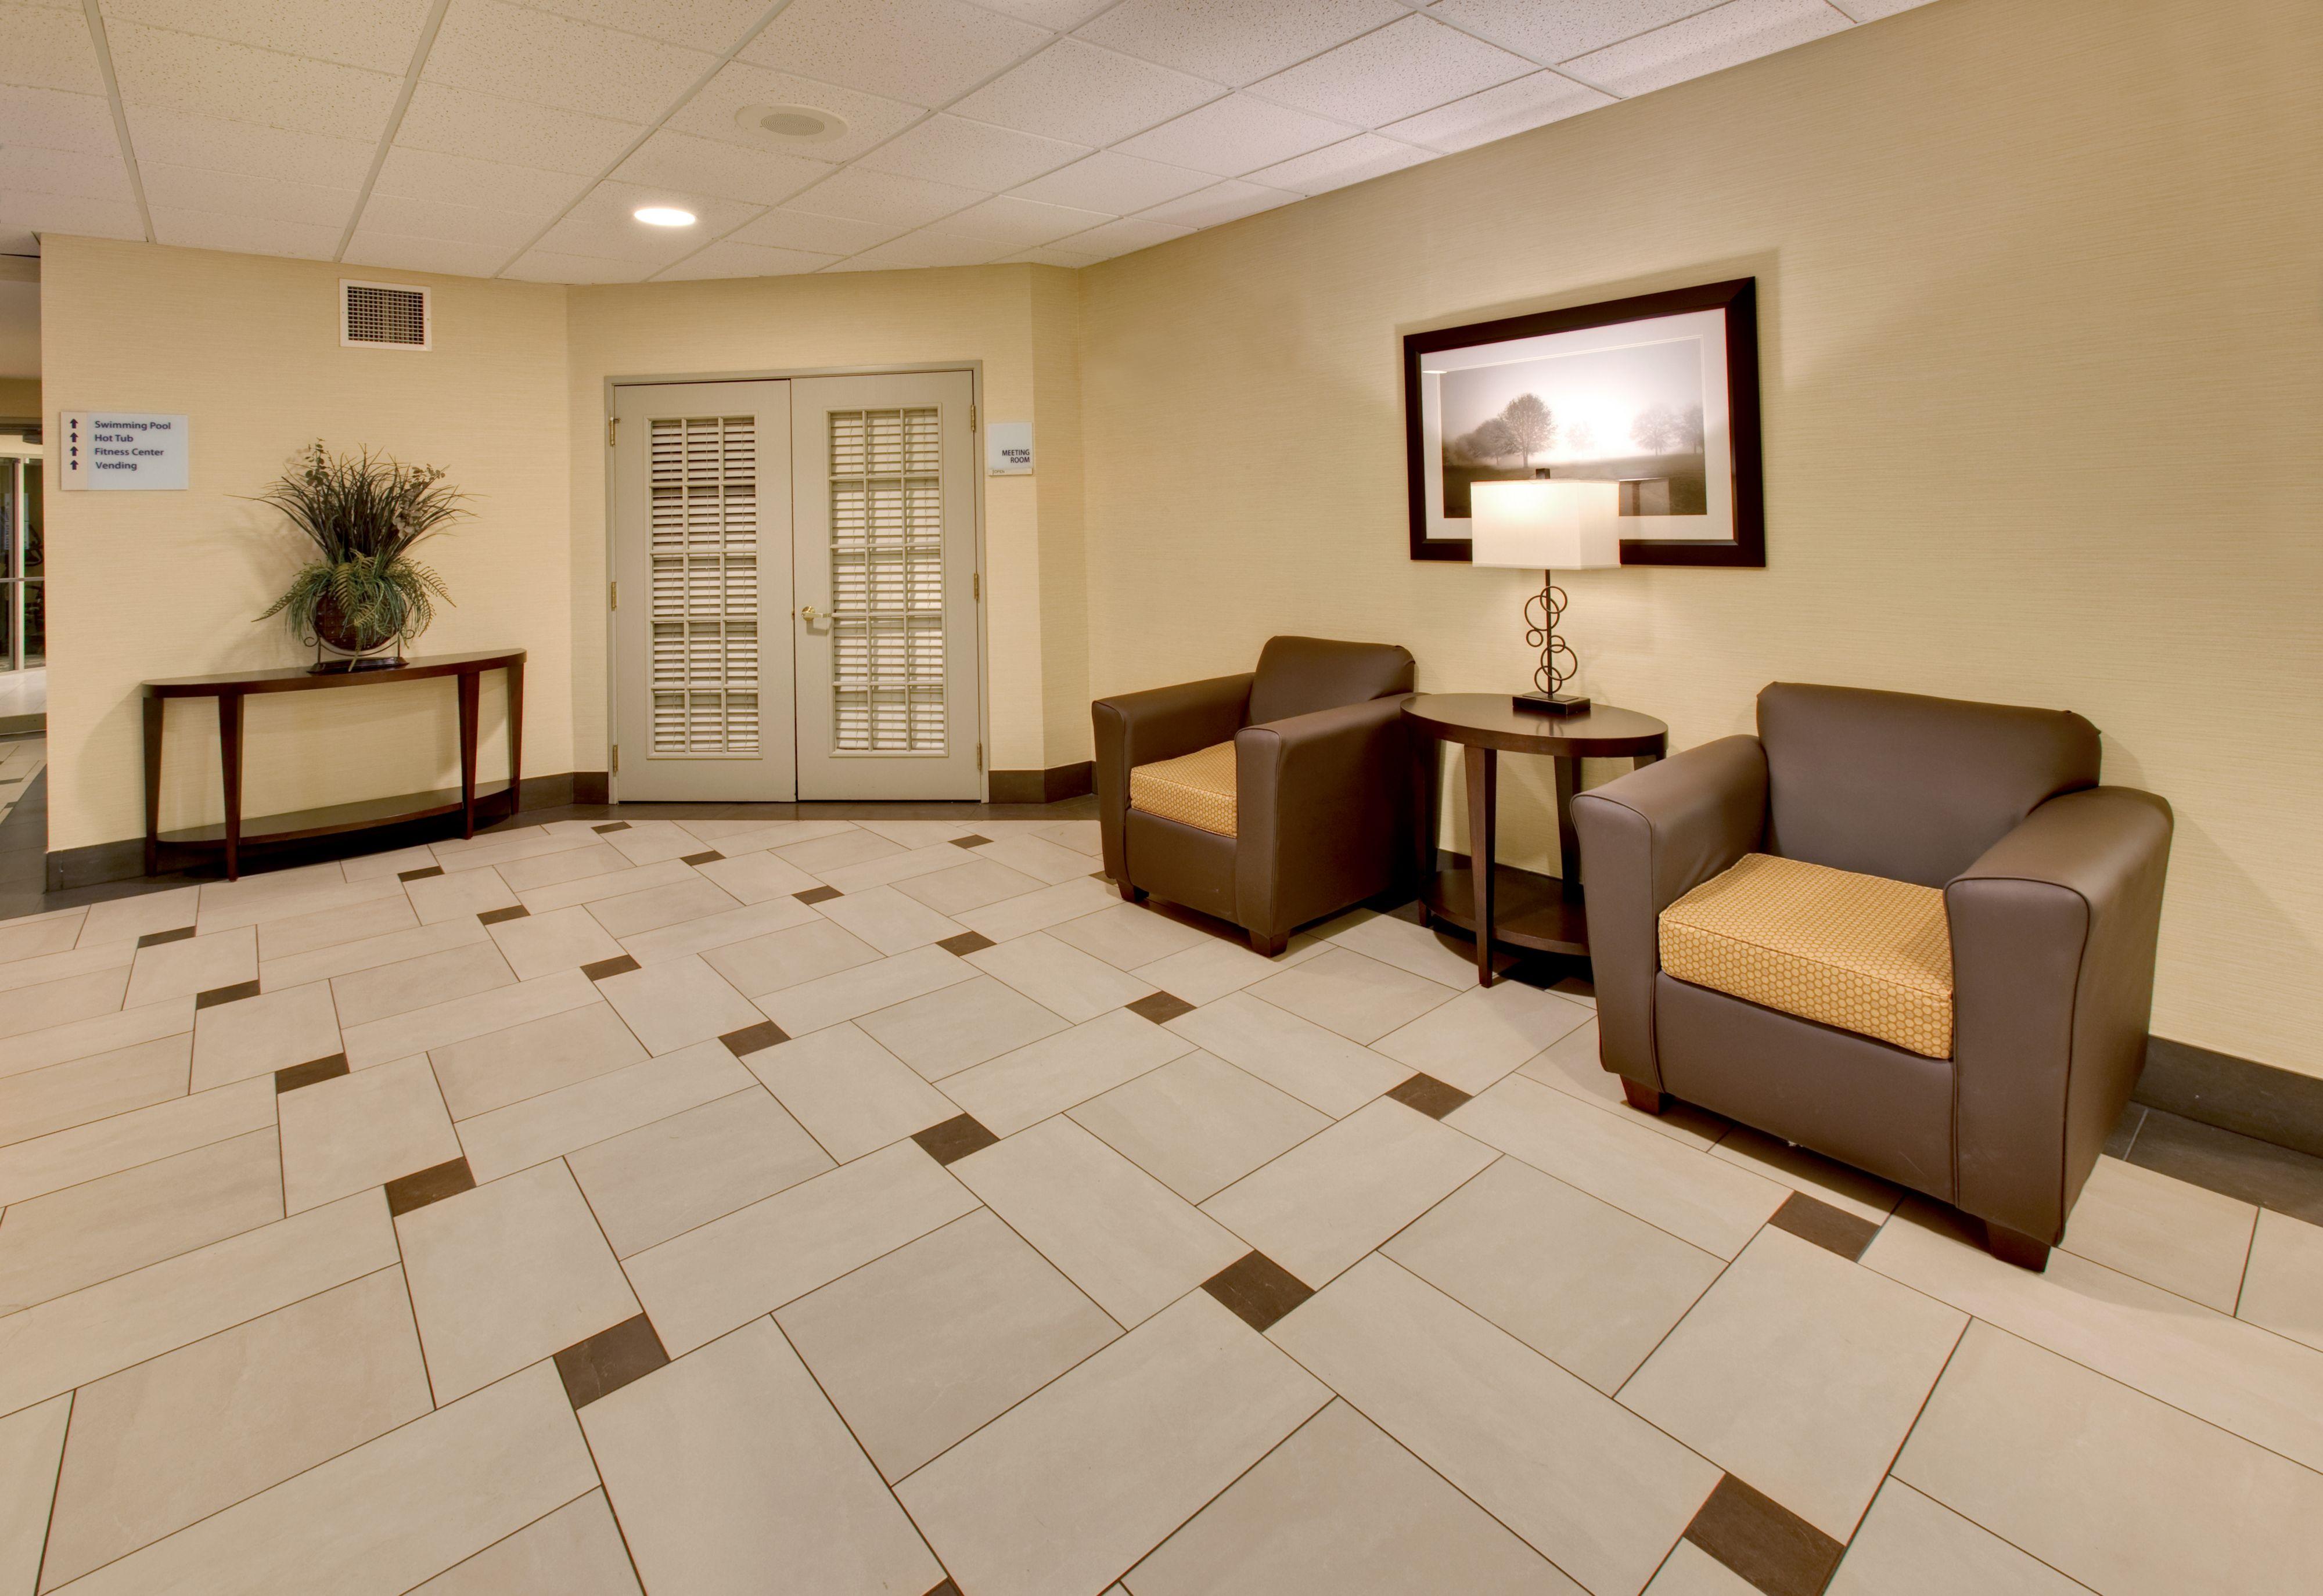 Holiday Inn Express & Suites Pleasant Prairie / Kenosha image 5